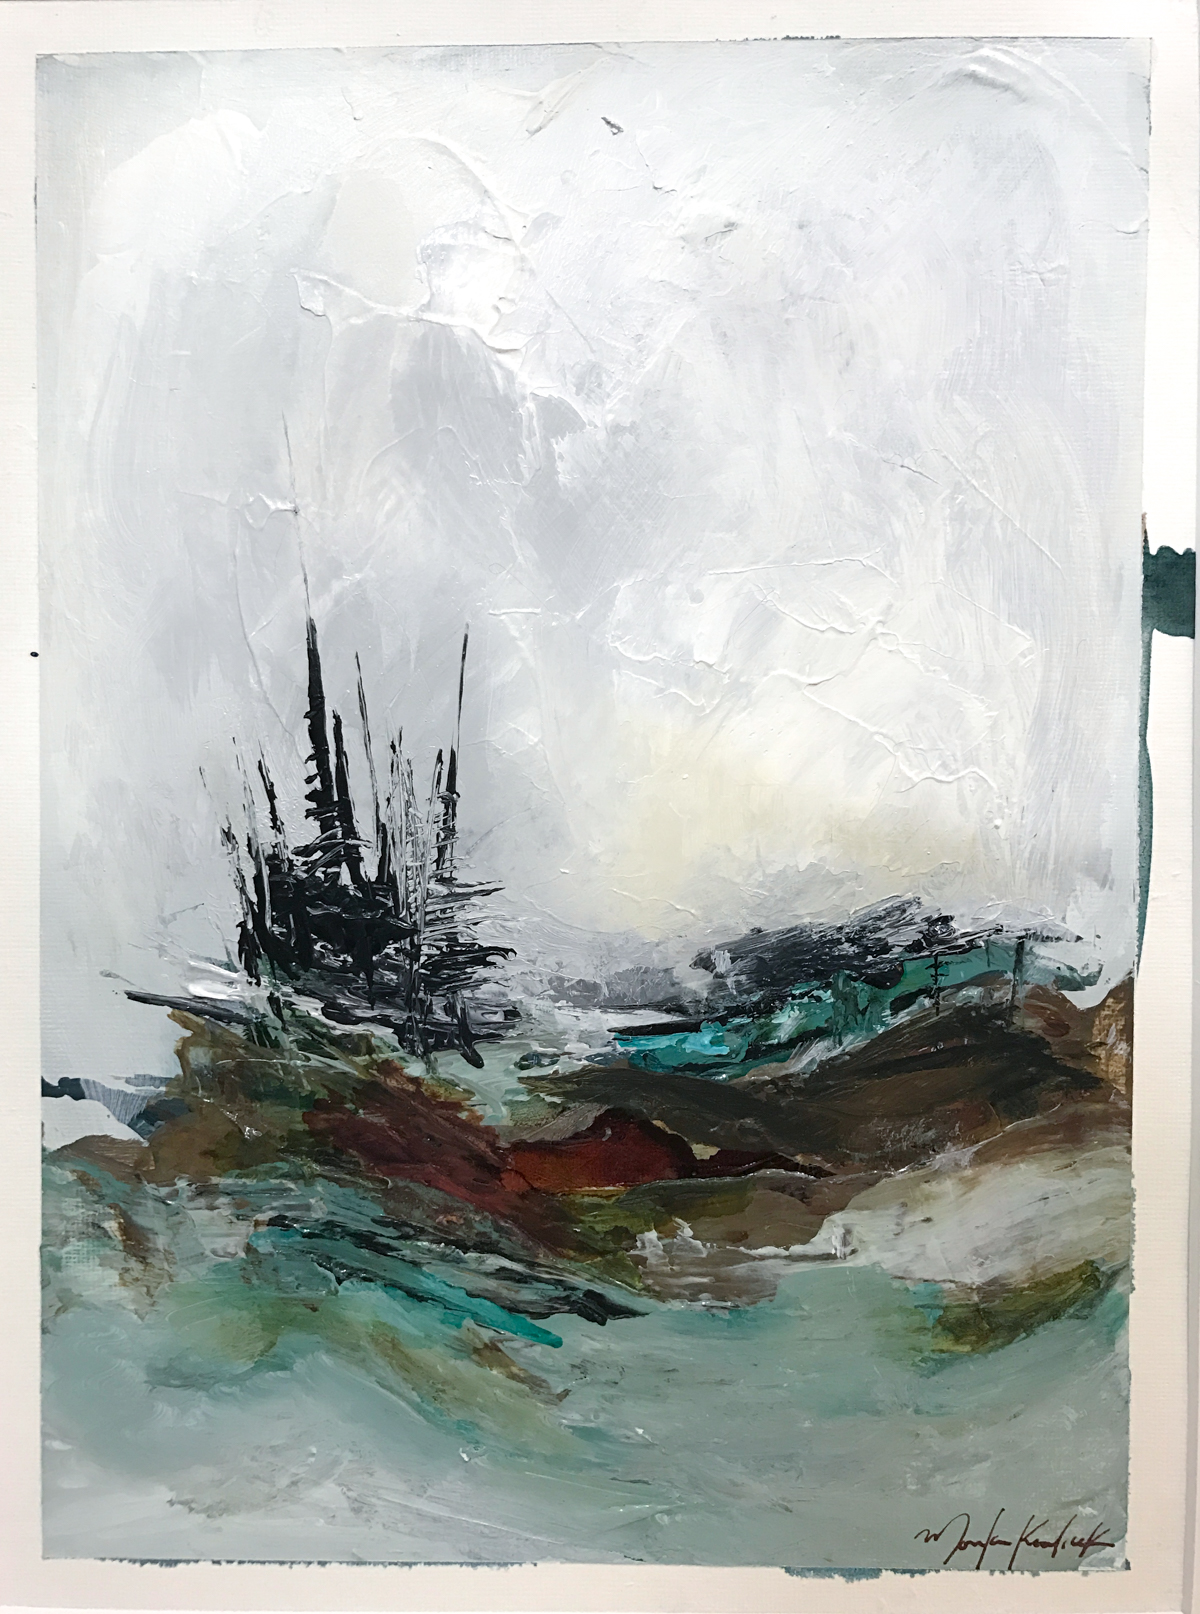 monika-kralicek-fine-art-2016-23.jpg